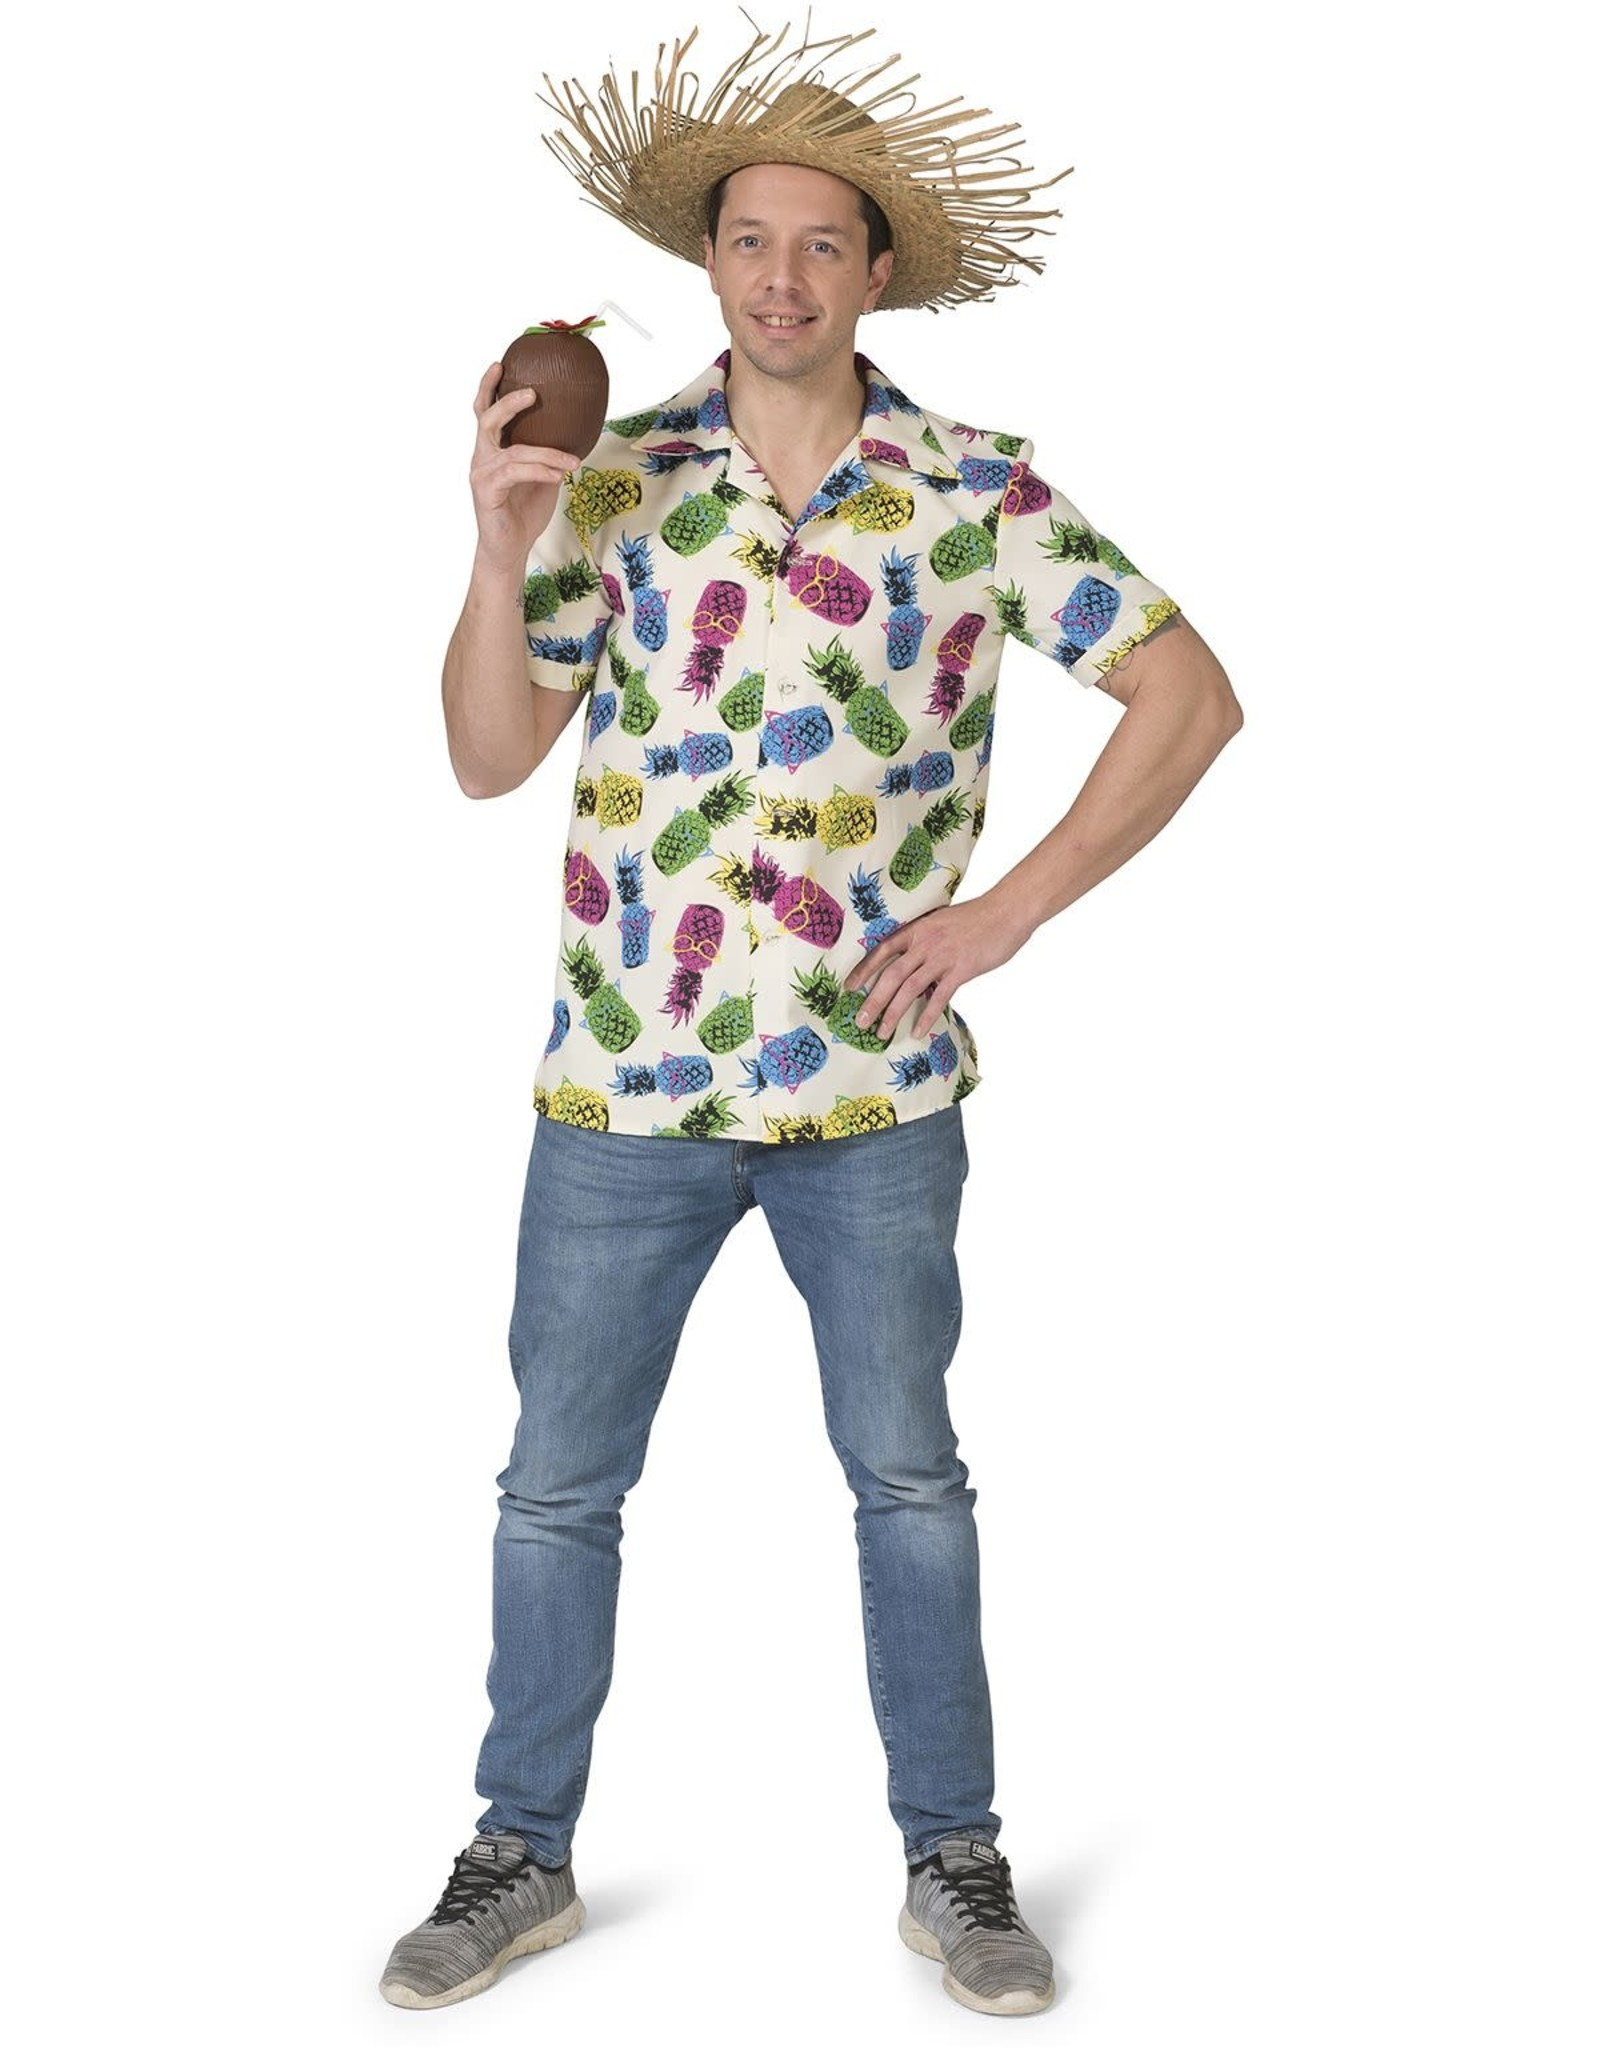 ESPA Hawaï hemd Pineapple